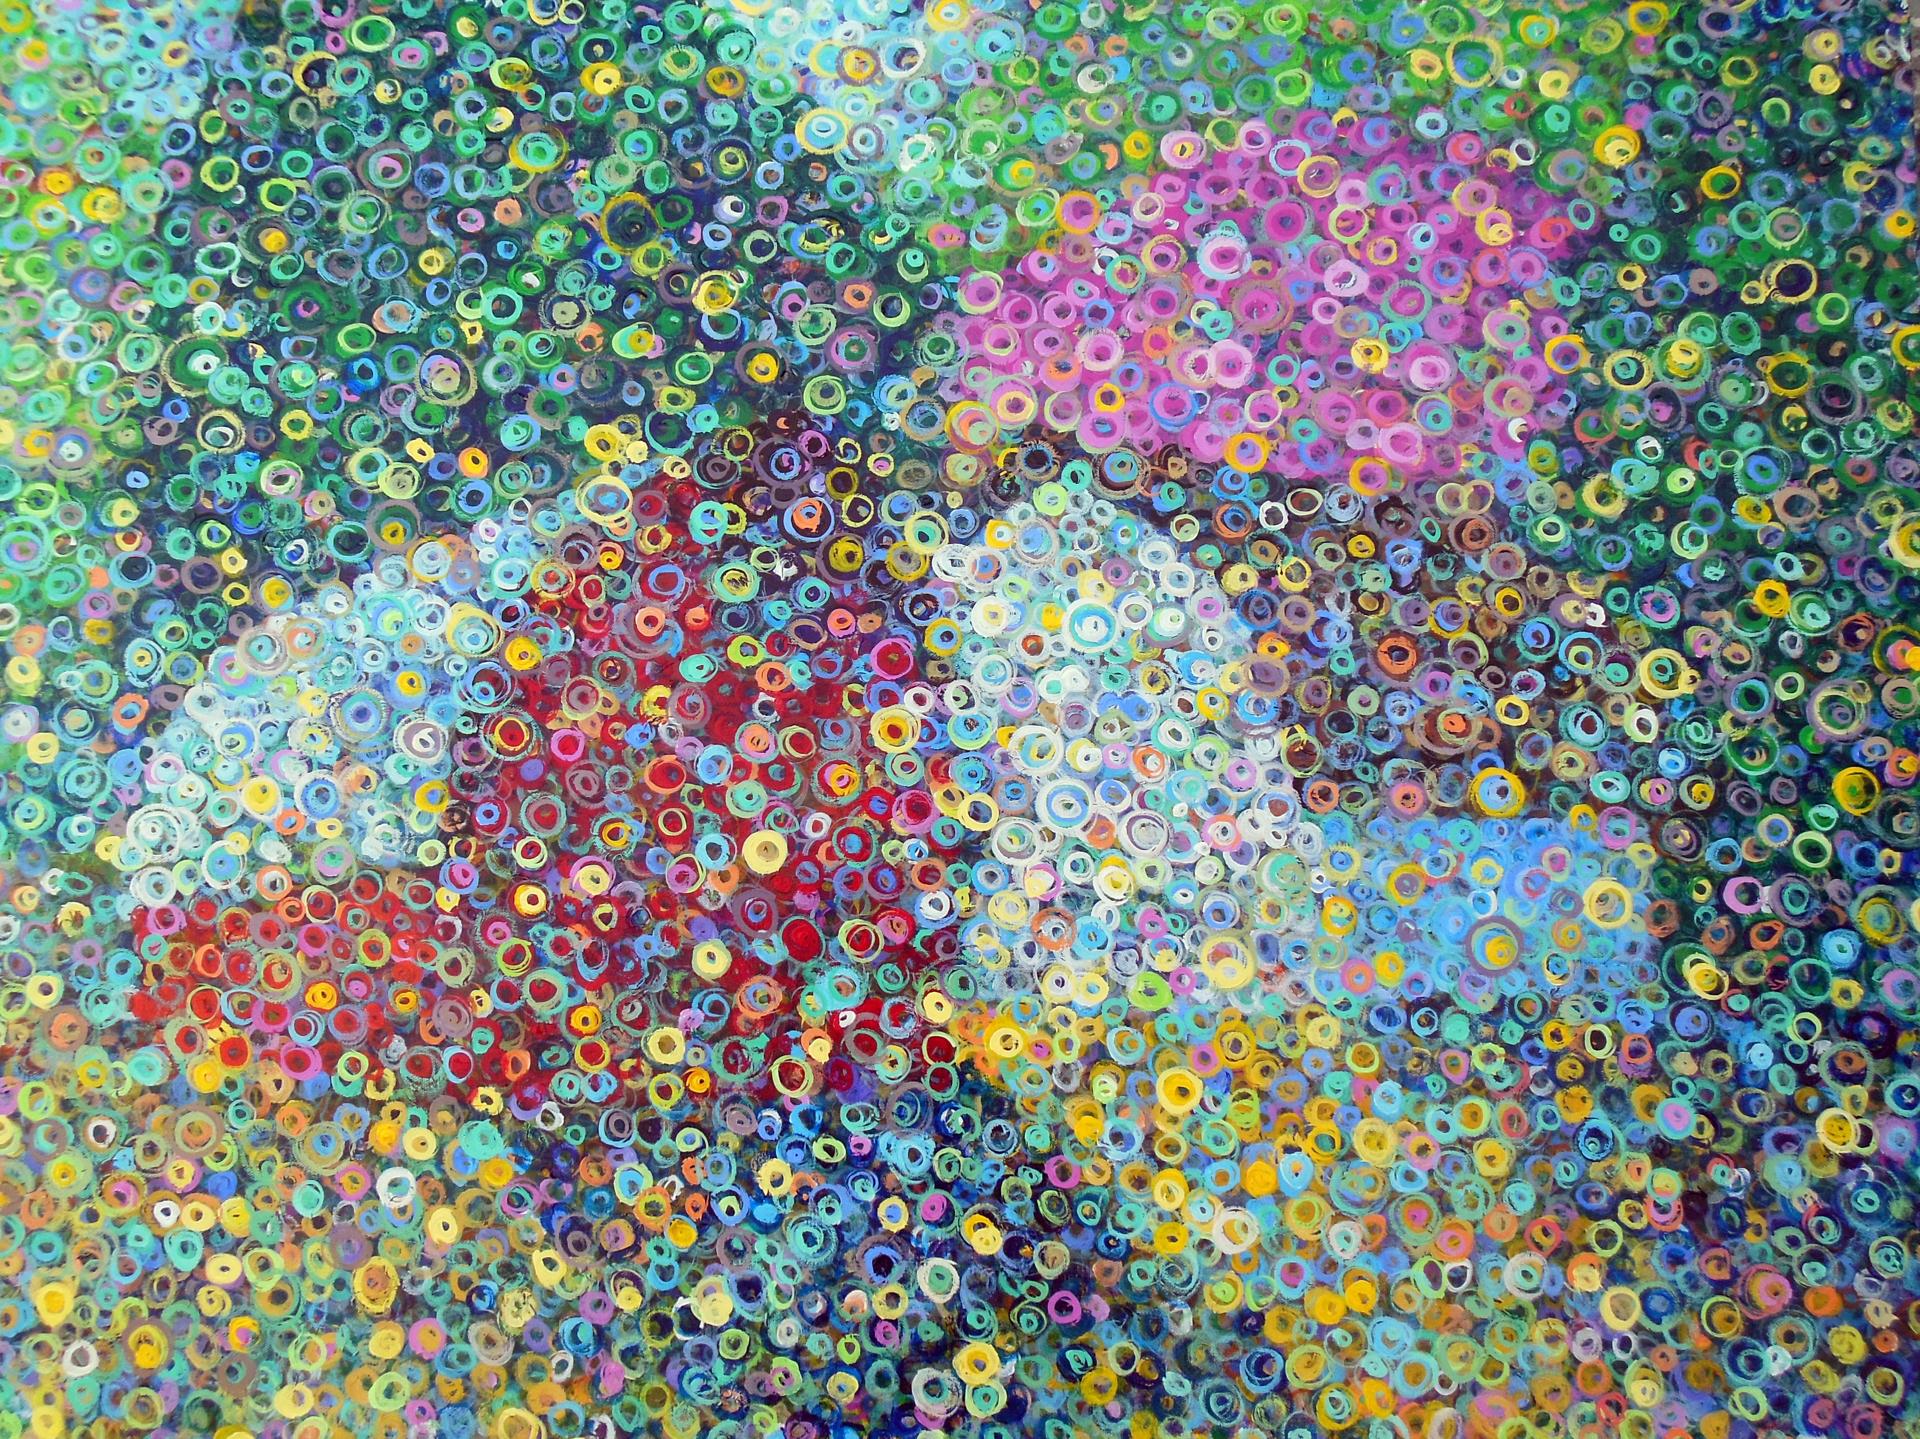 Blooming Behind the Barns by Marcio Diaz